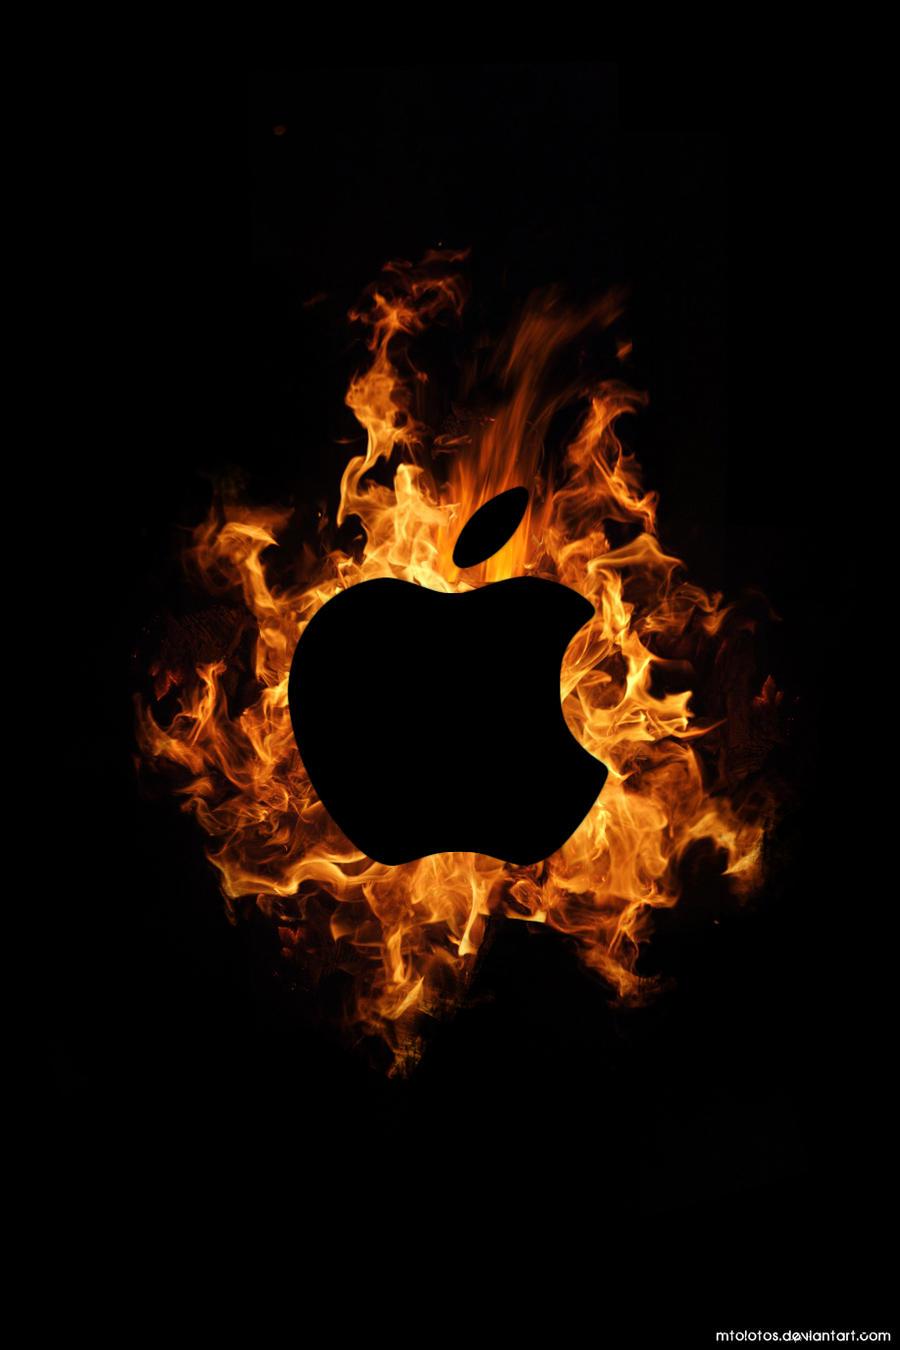 Image Result For Apple Mac Wallpaper Download